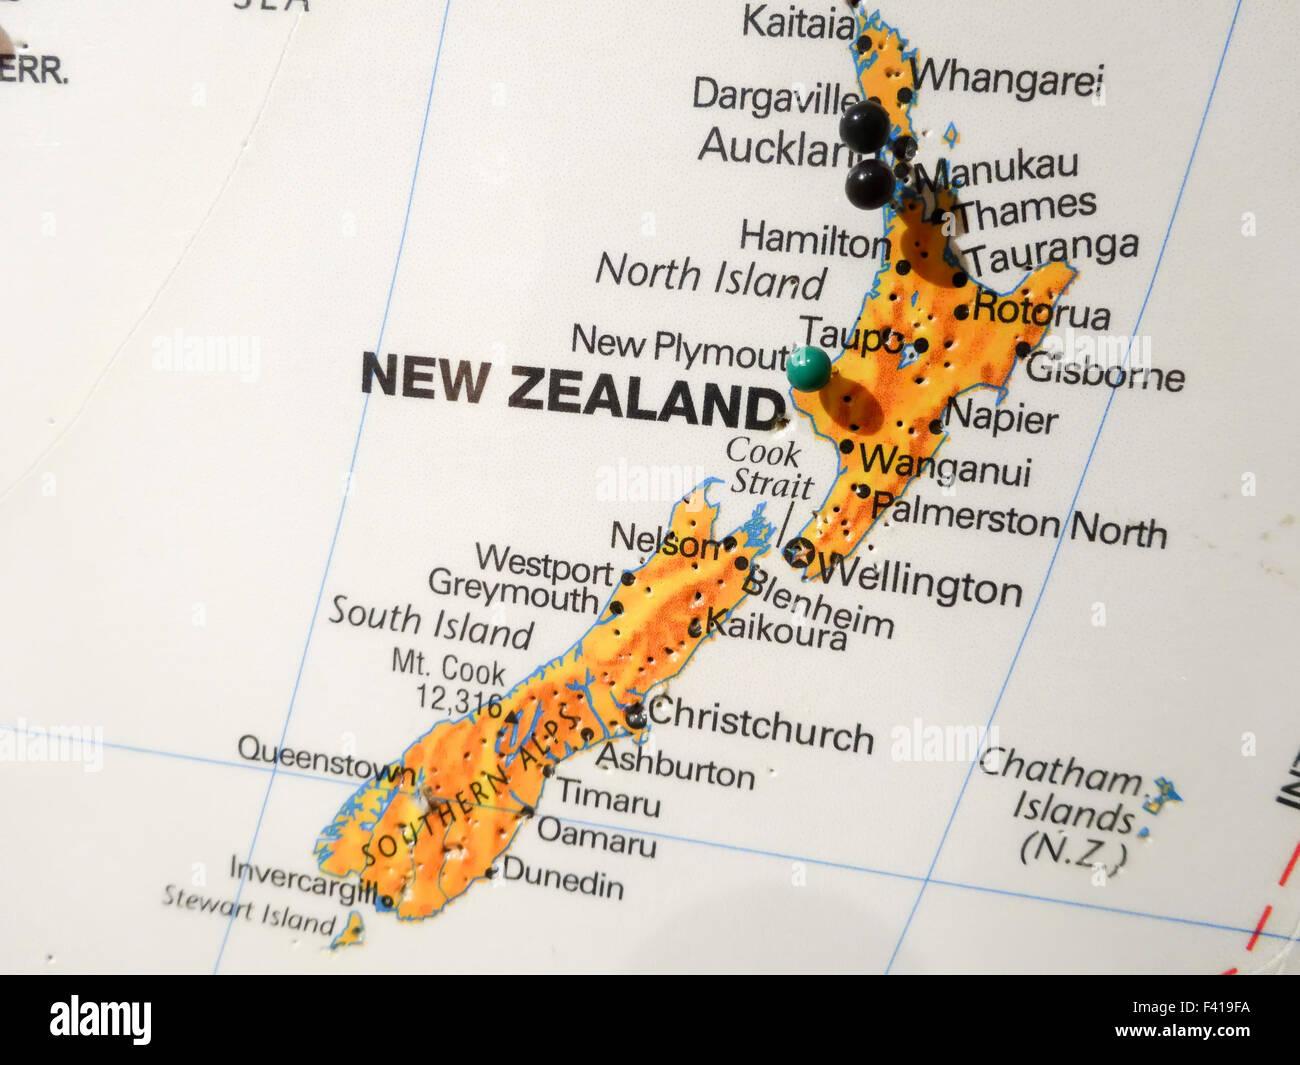 City Map Of New Zealand.City Pin On New Zealand Map Stock Photo 88539902 Alamy